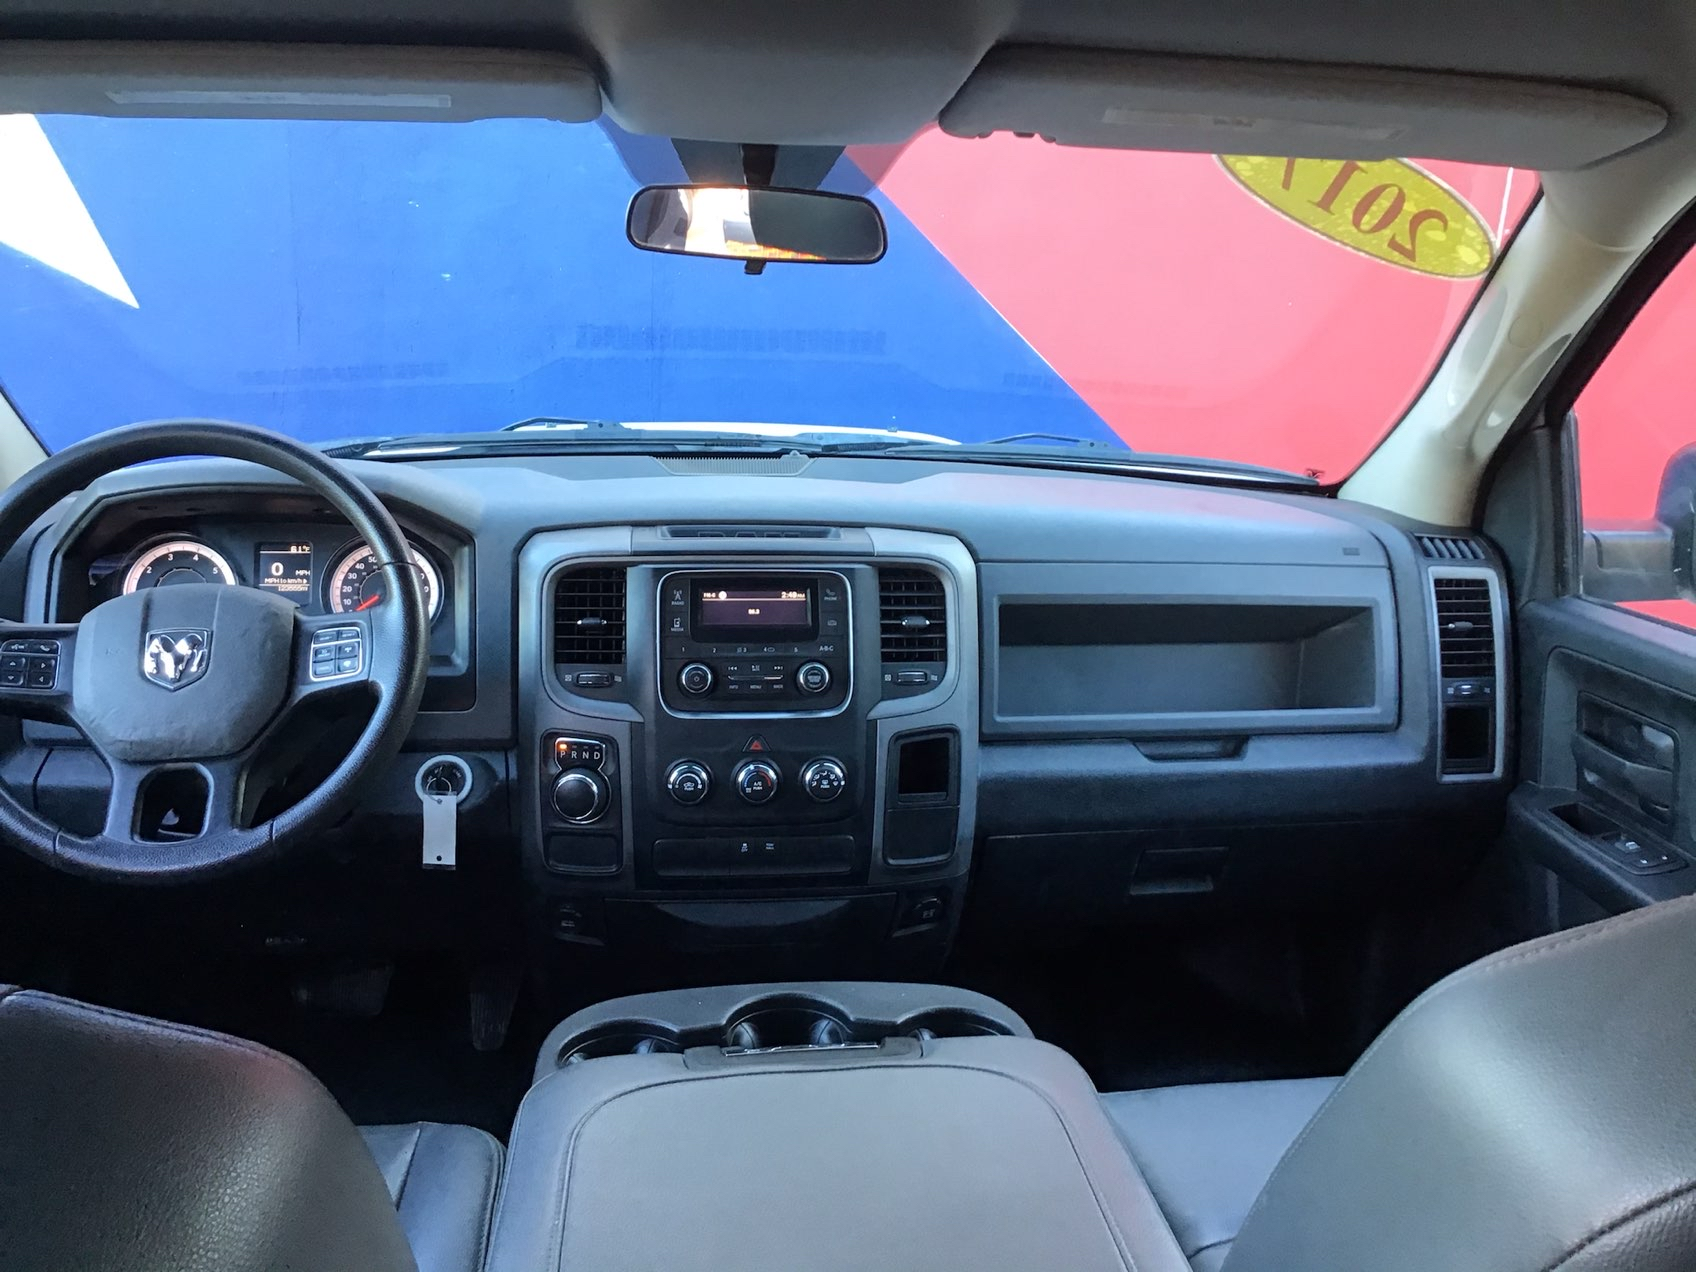 used vehicle - Truck RAM 1500 2017